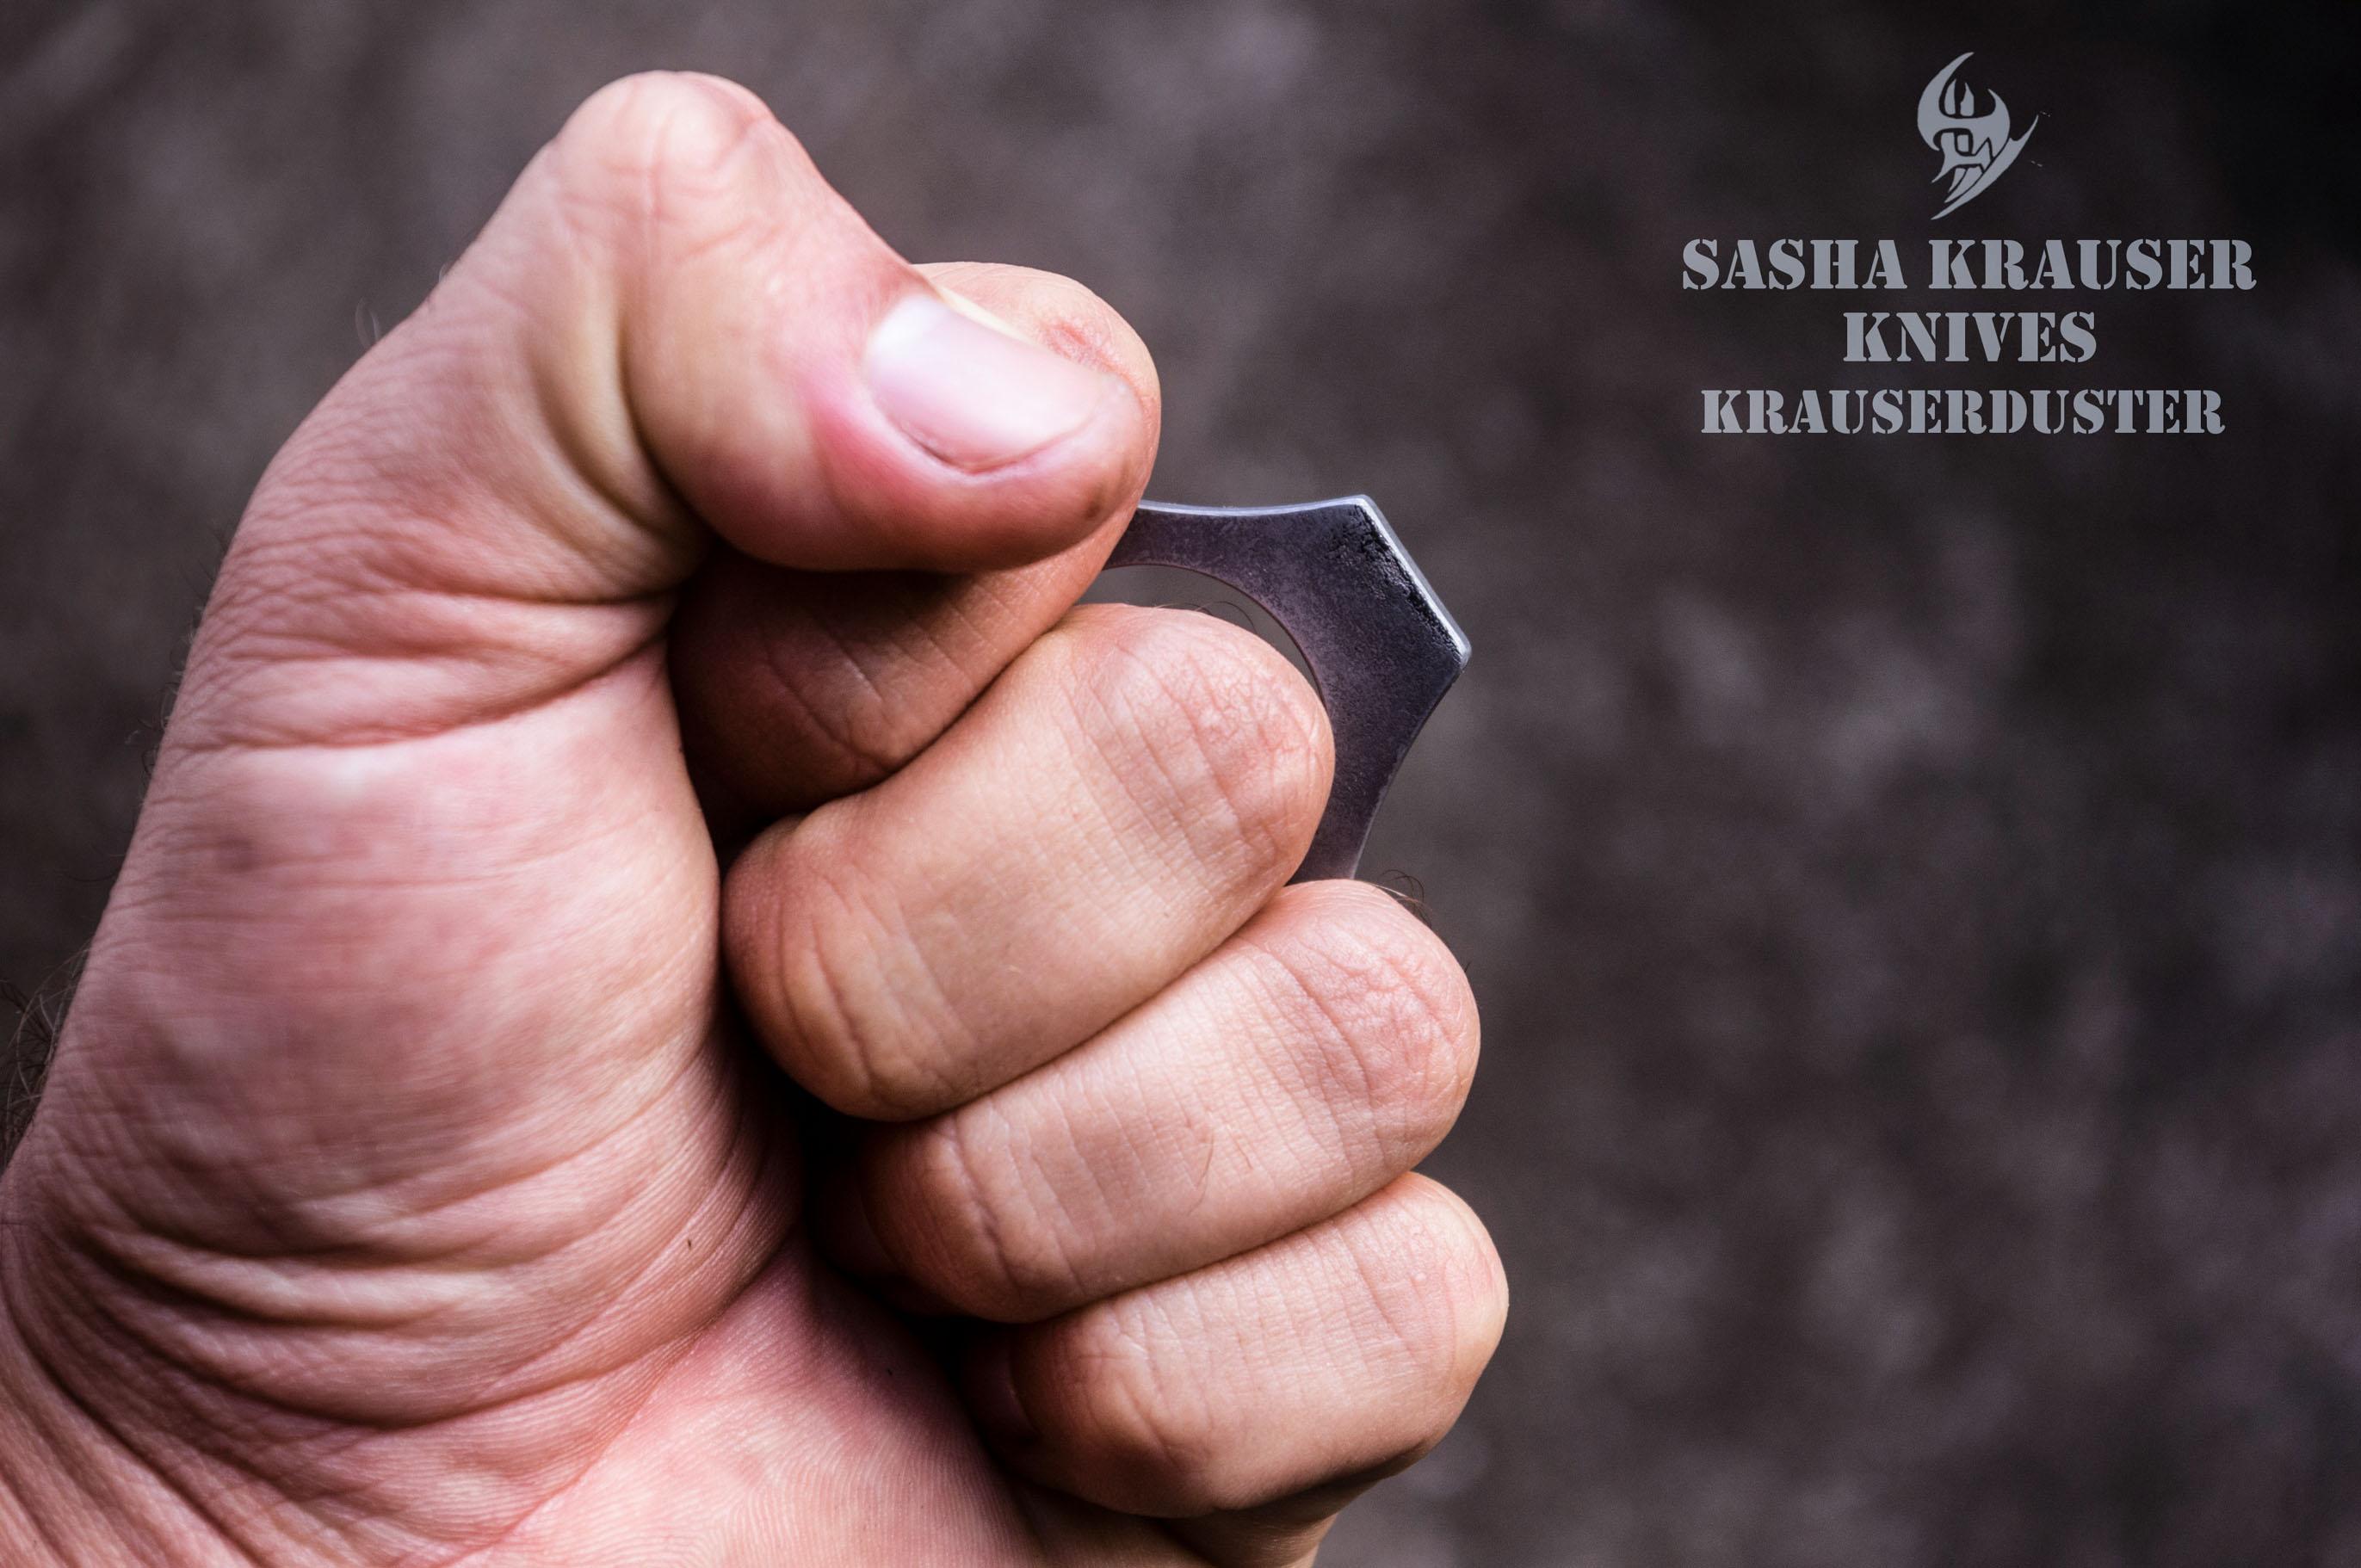 Knuckledusters alternative defense